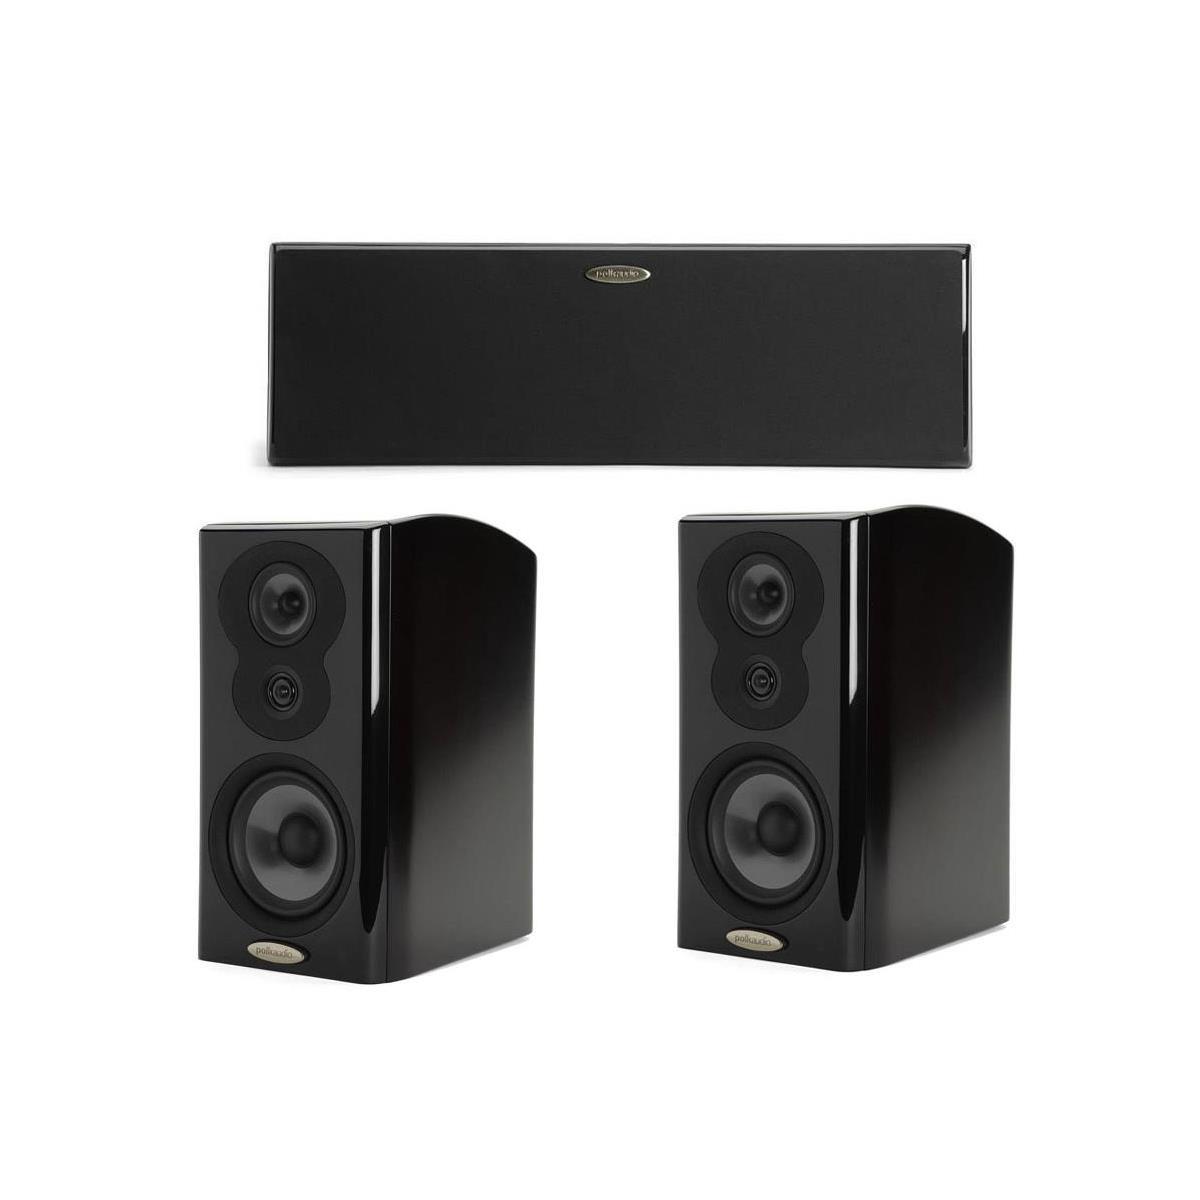 Polk LSI Bundles: M706 Center + 2x M703 Bookshelf Speakers  $1350 & More + Free S&H